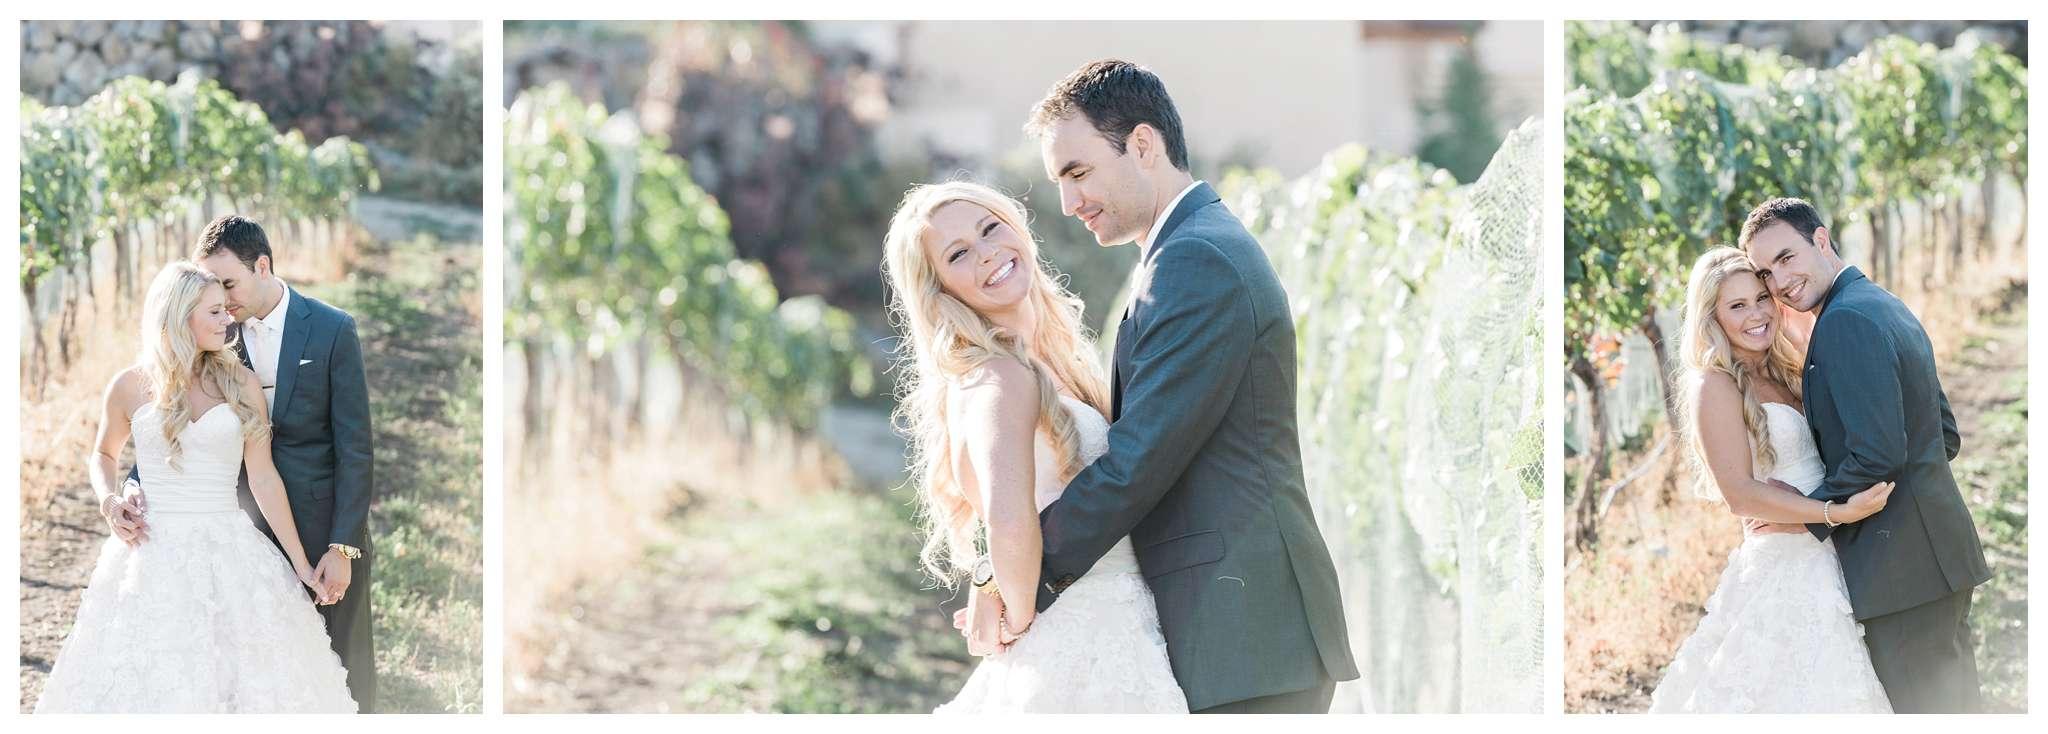 Karma Vineyard Chelan Wedding Photographer